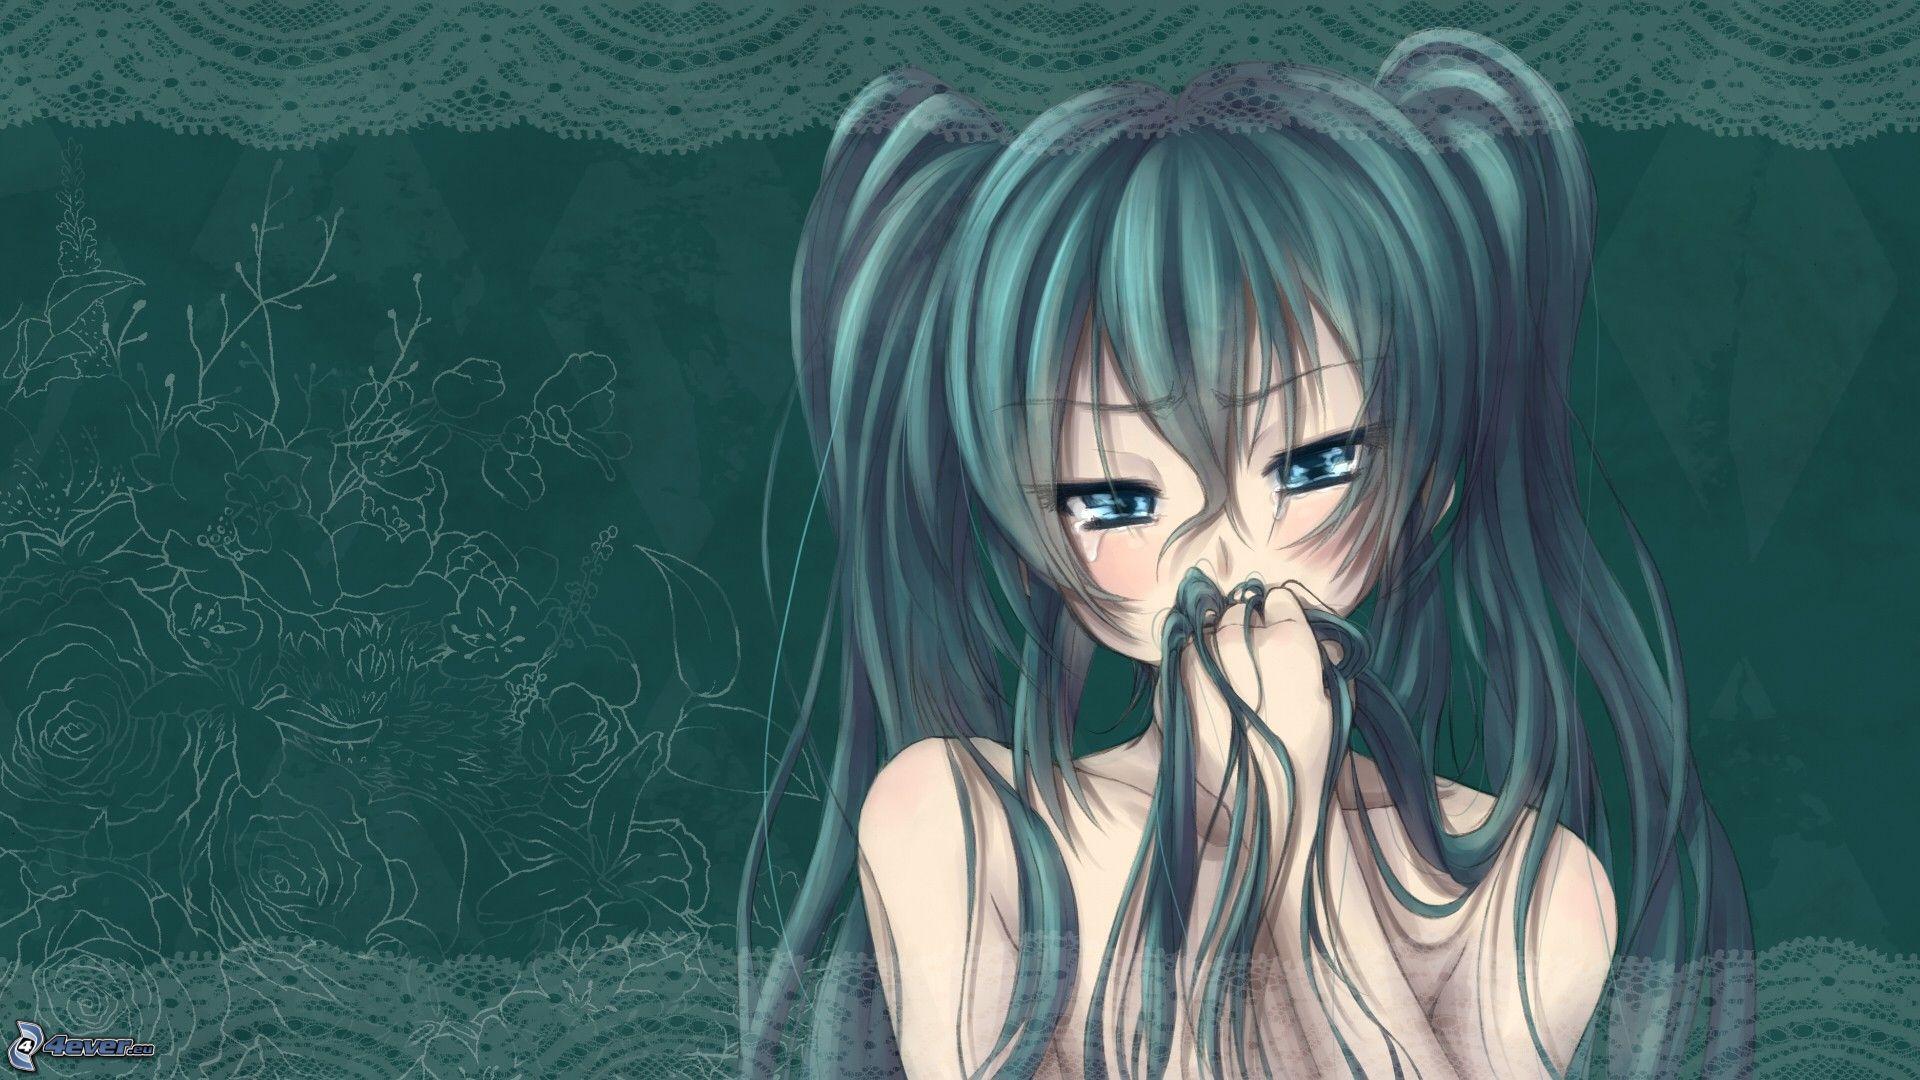 Anime fille - Image manga fille triste ...